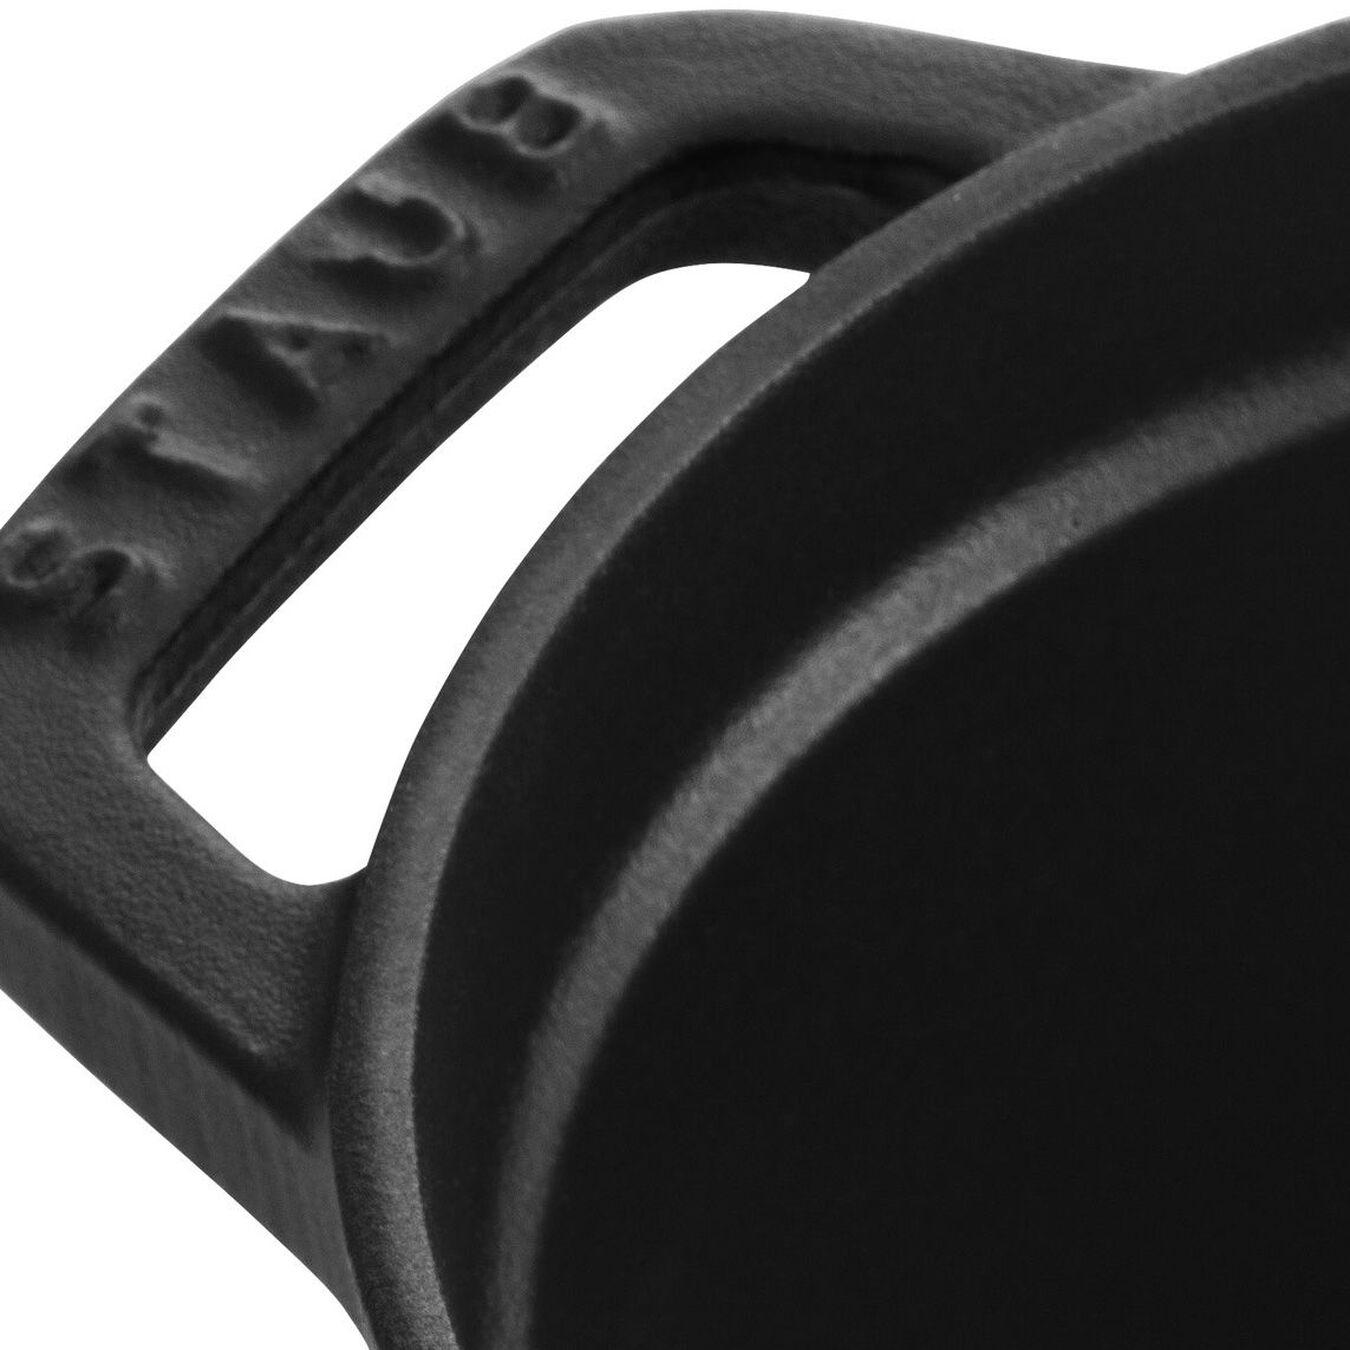 1 l Cast iron oval Faitout, Black,,large 4